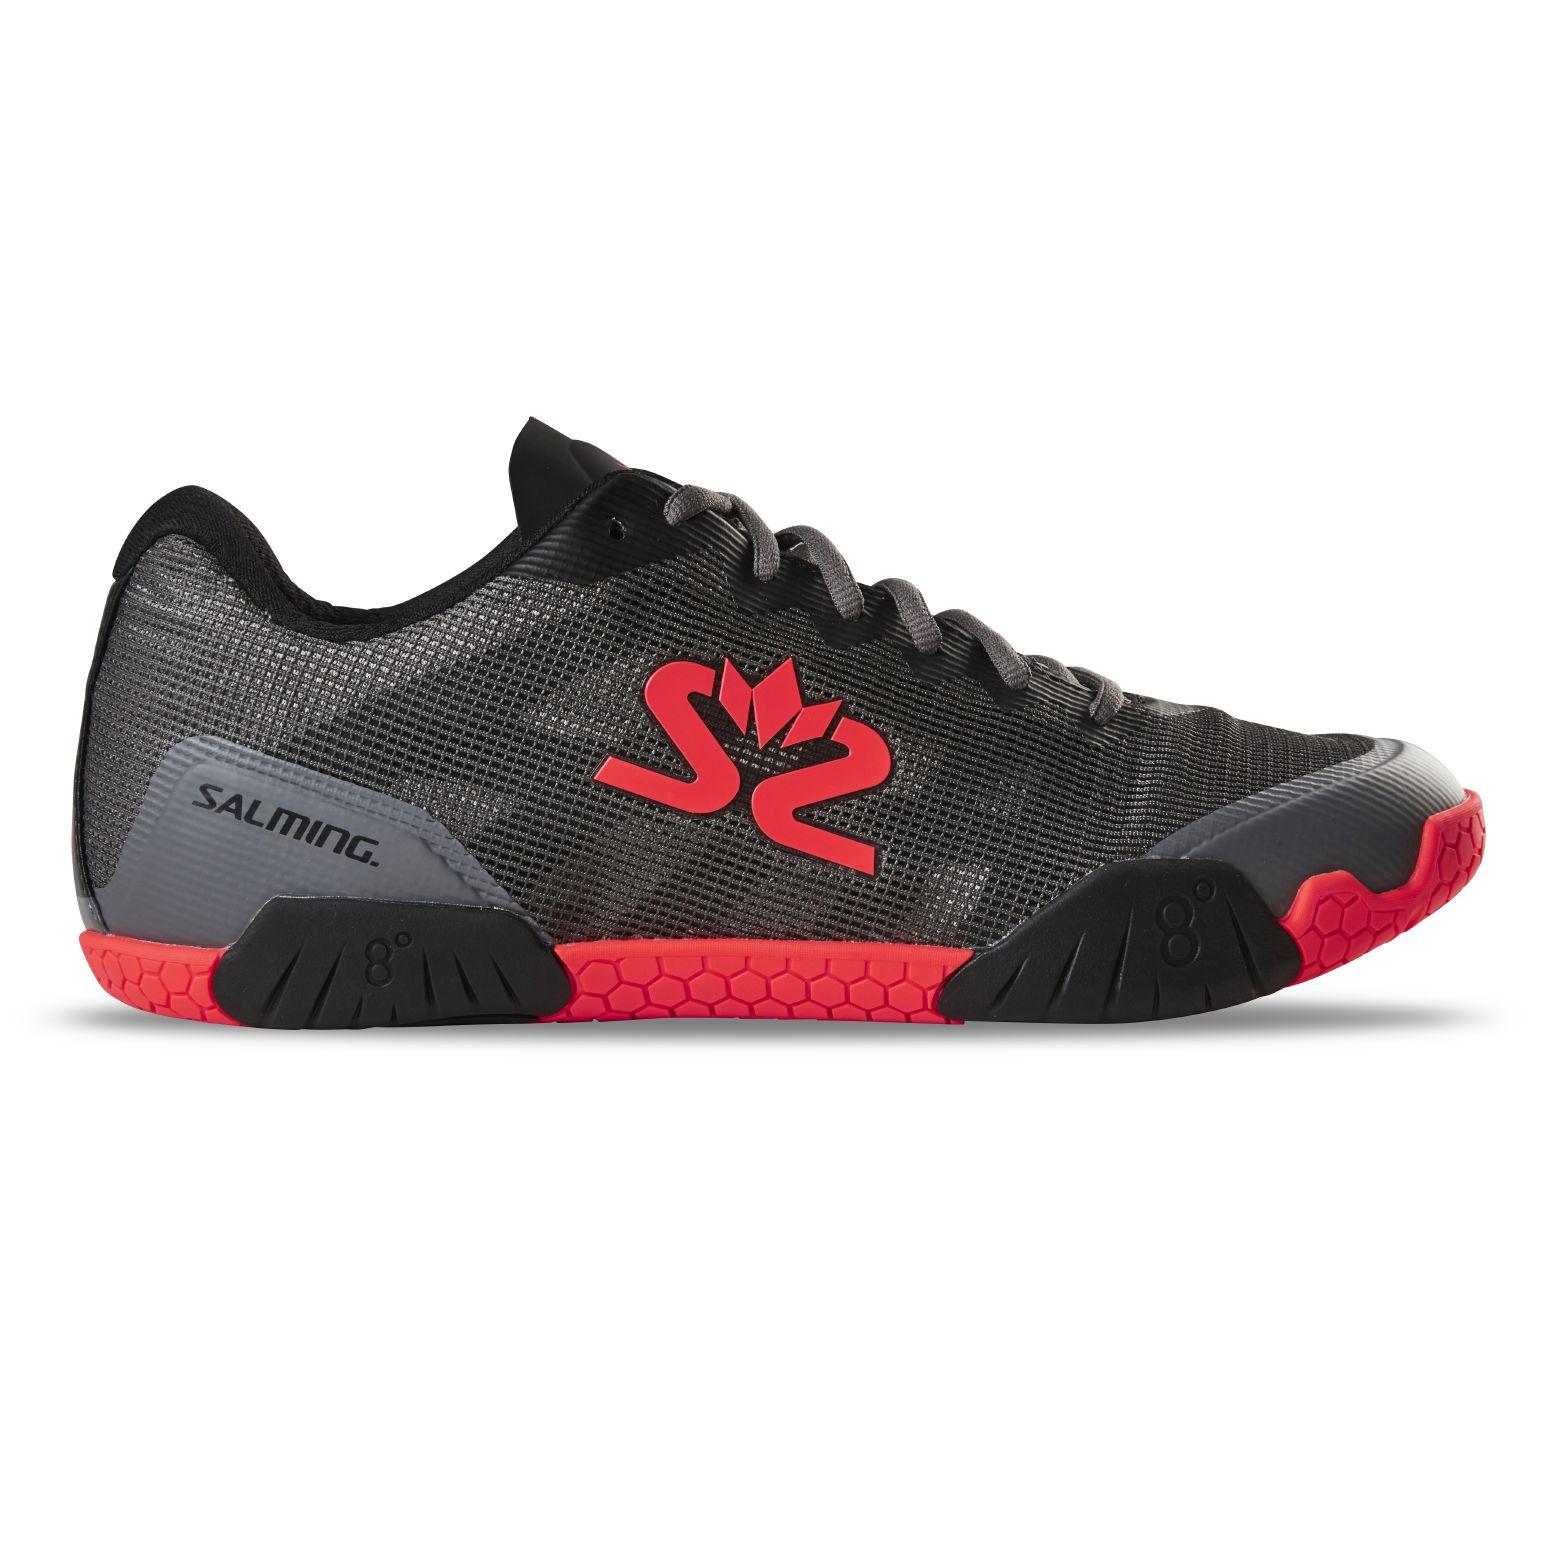 Salming Hawk Shoe Men GunMetal/Red 10,5 UK - 46 EUR - 29,5 cm